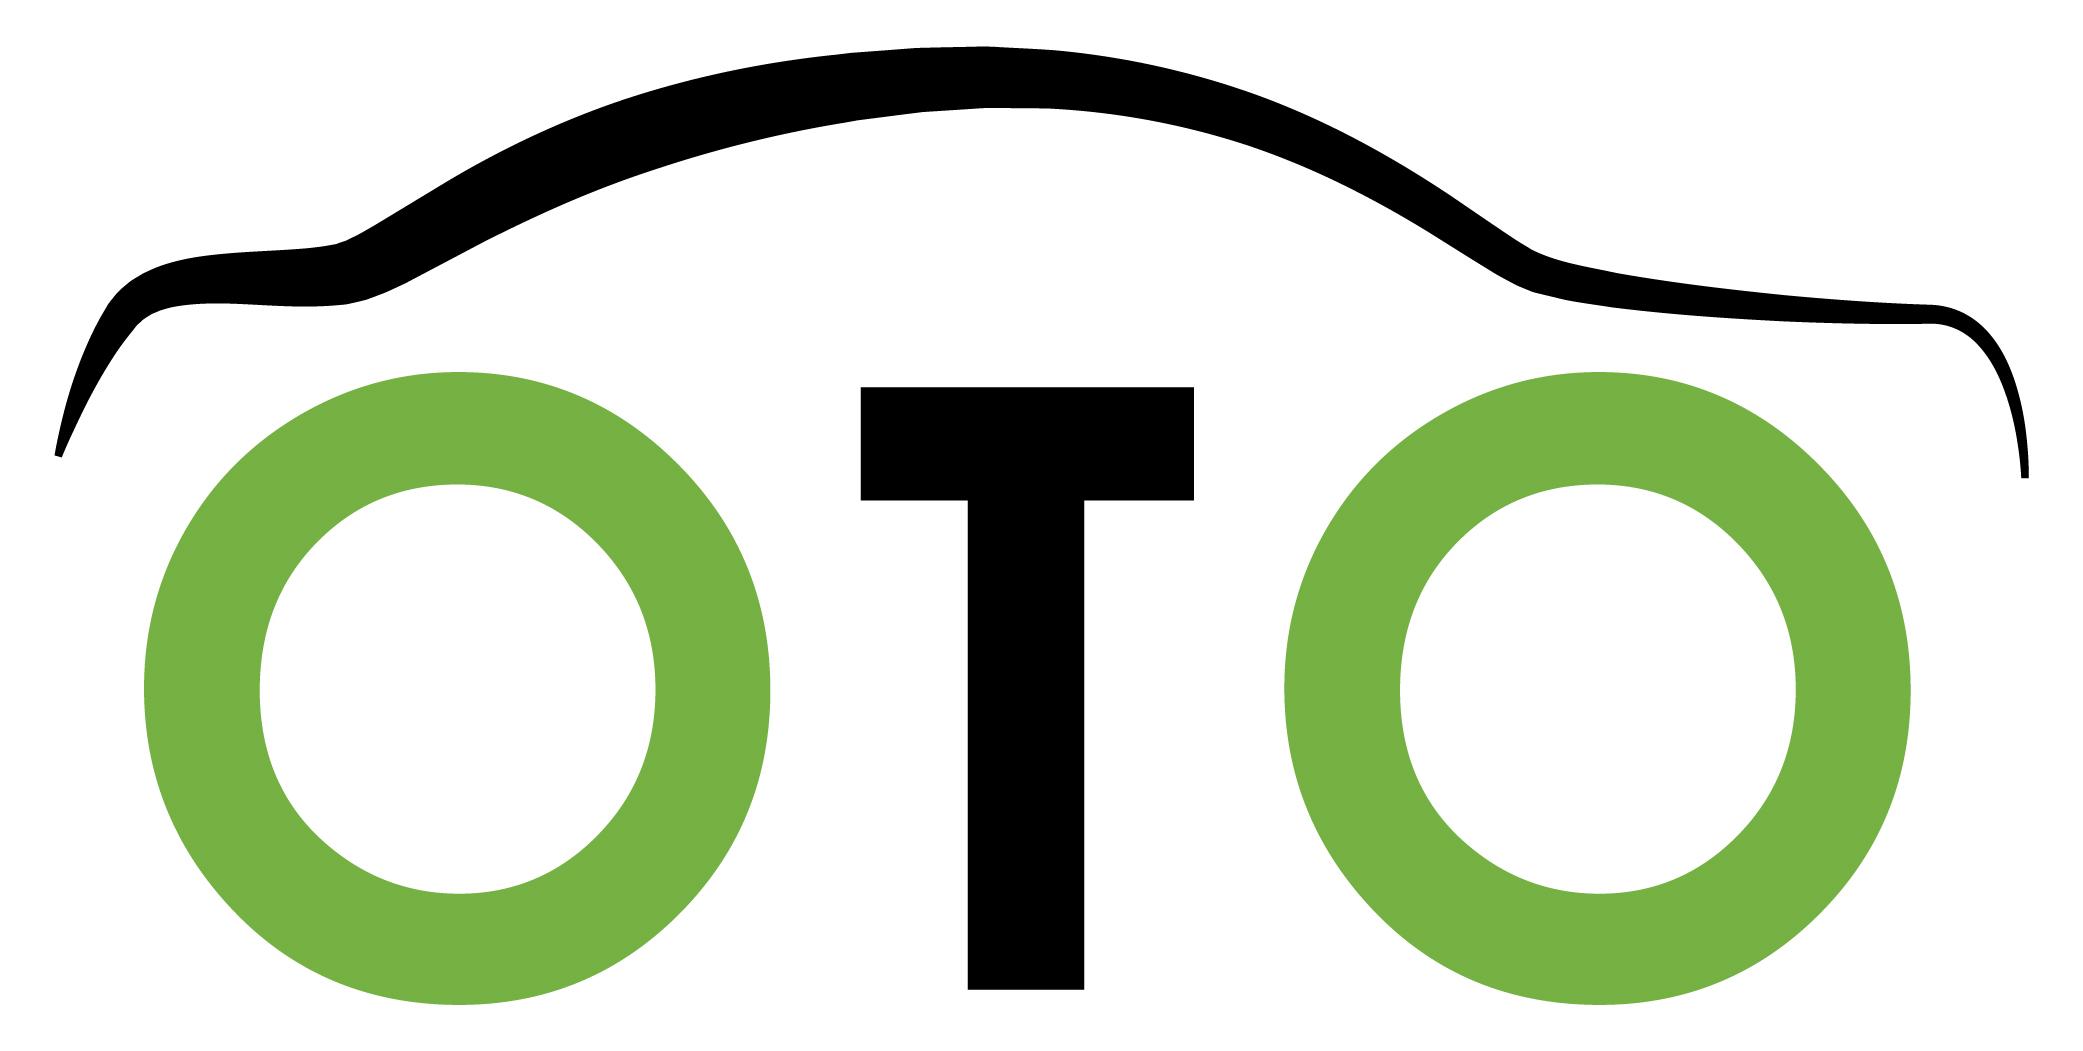 The logo of OTO Capital